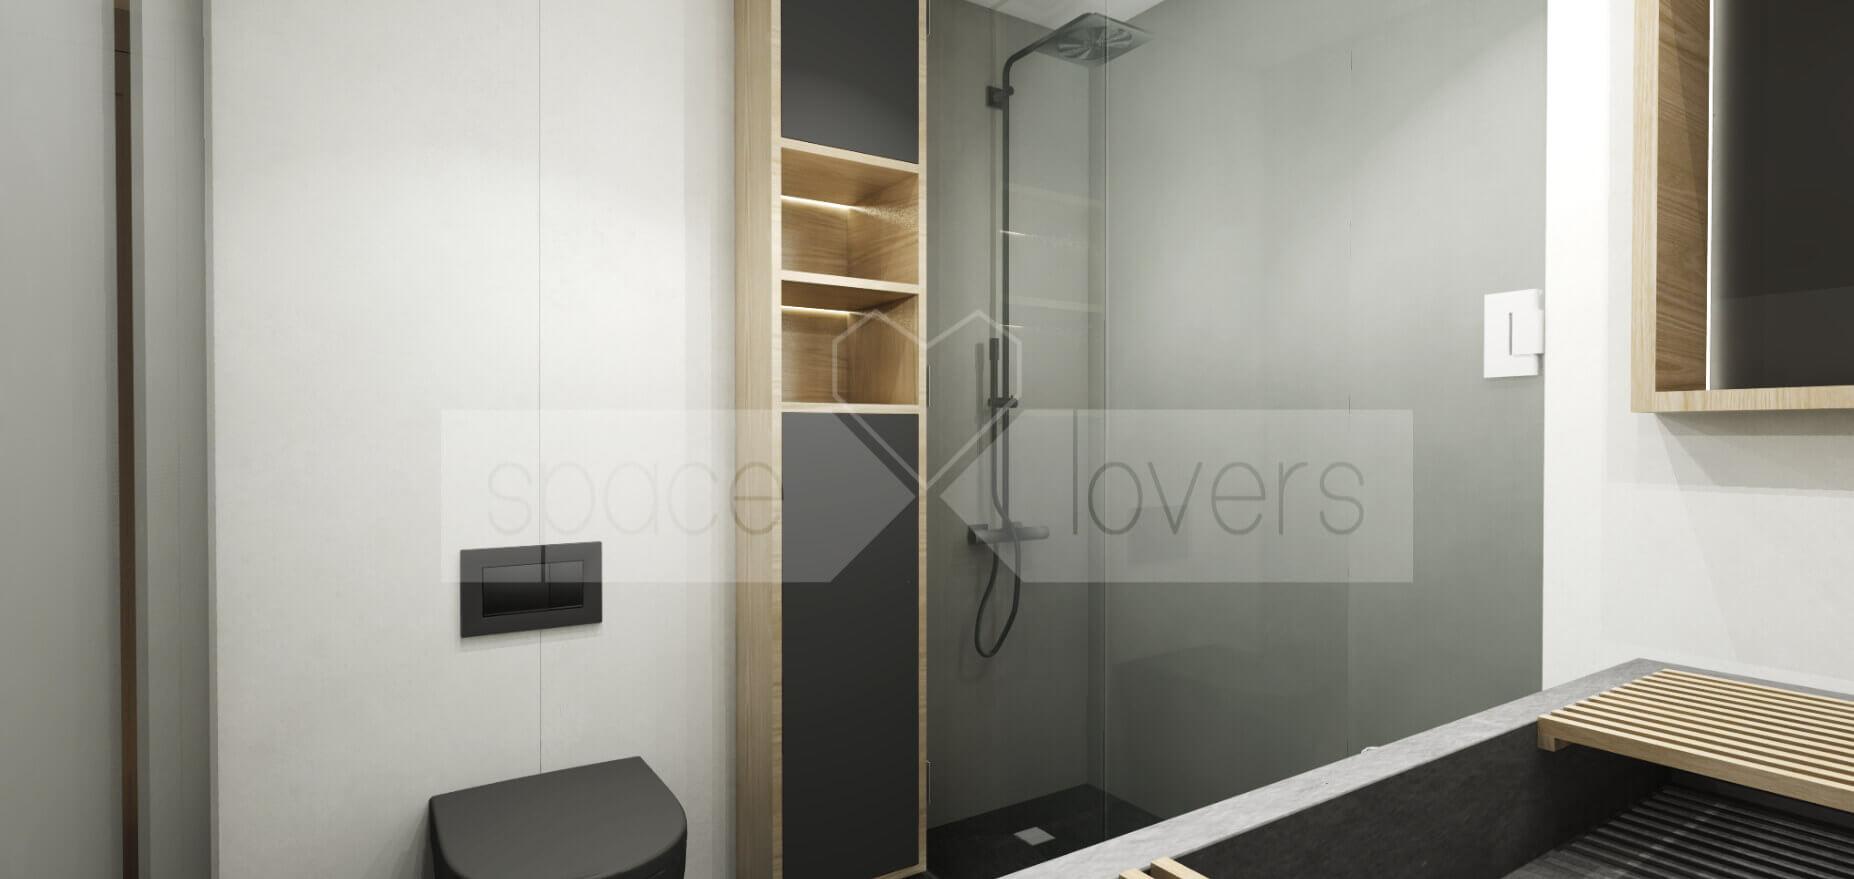 remodelacao-apartamento-parque-das-nacoes-lisboa-casa-banho-suite-bancada-ardosia-duche-resguardo